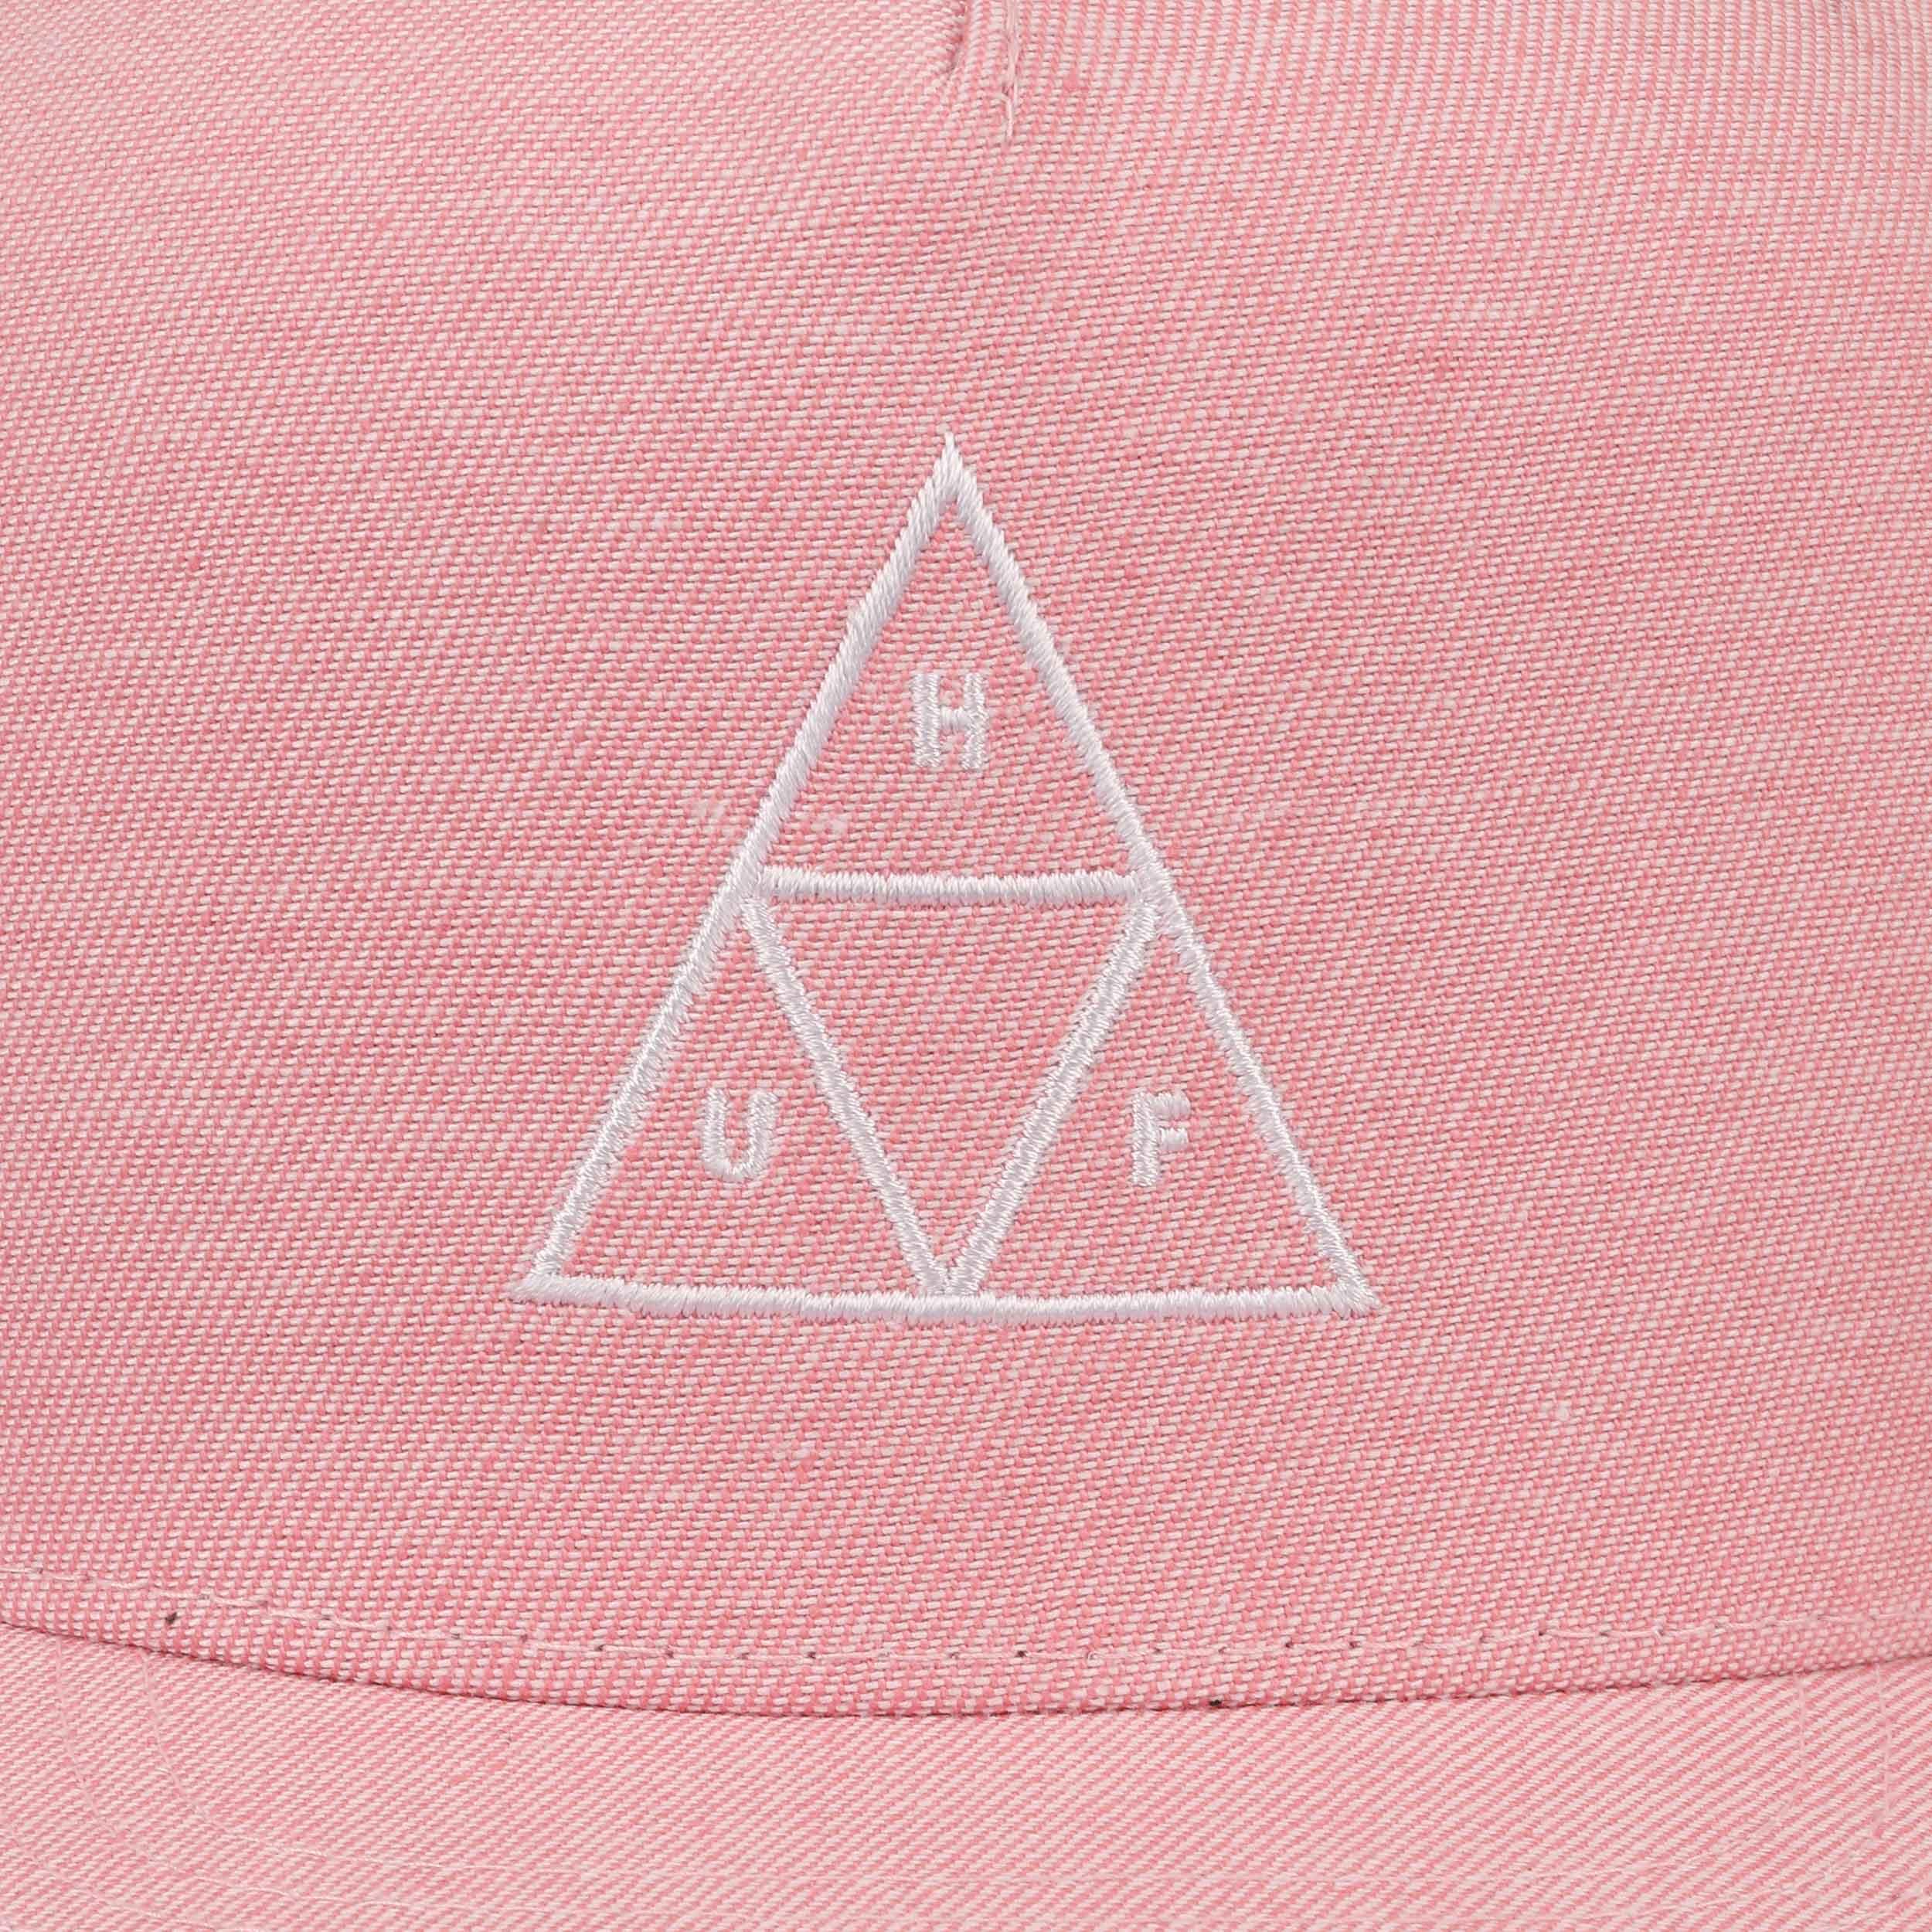 4b56ba03c28a1 Gorra Triple Triangle Pastel Snapback by HUF - Gorras - sombreroshop.es